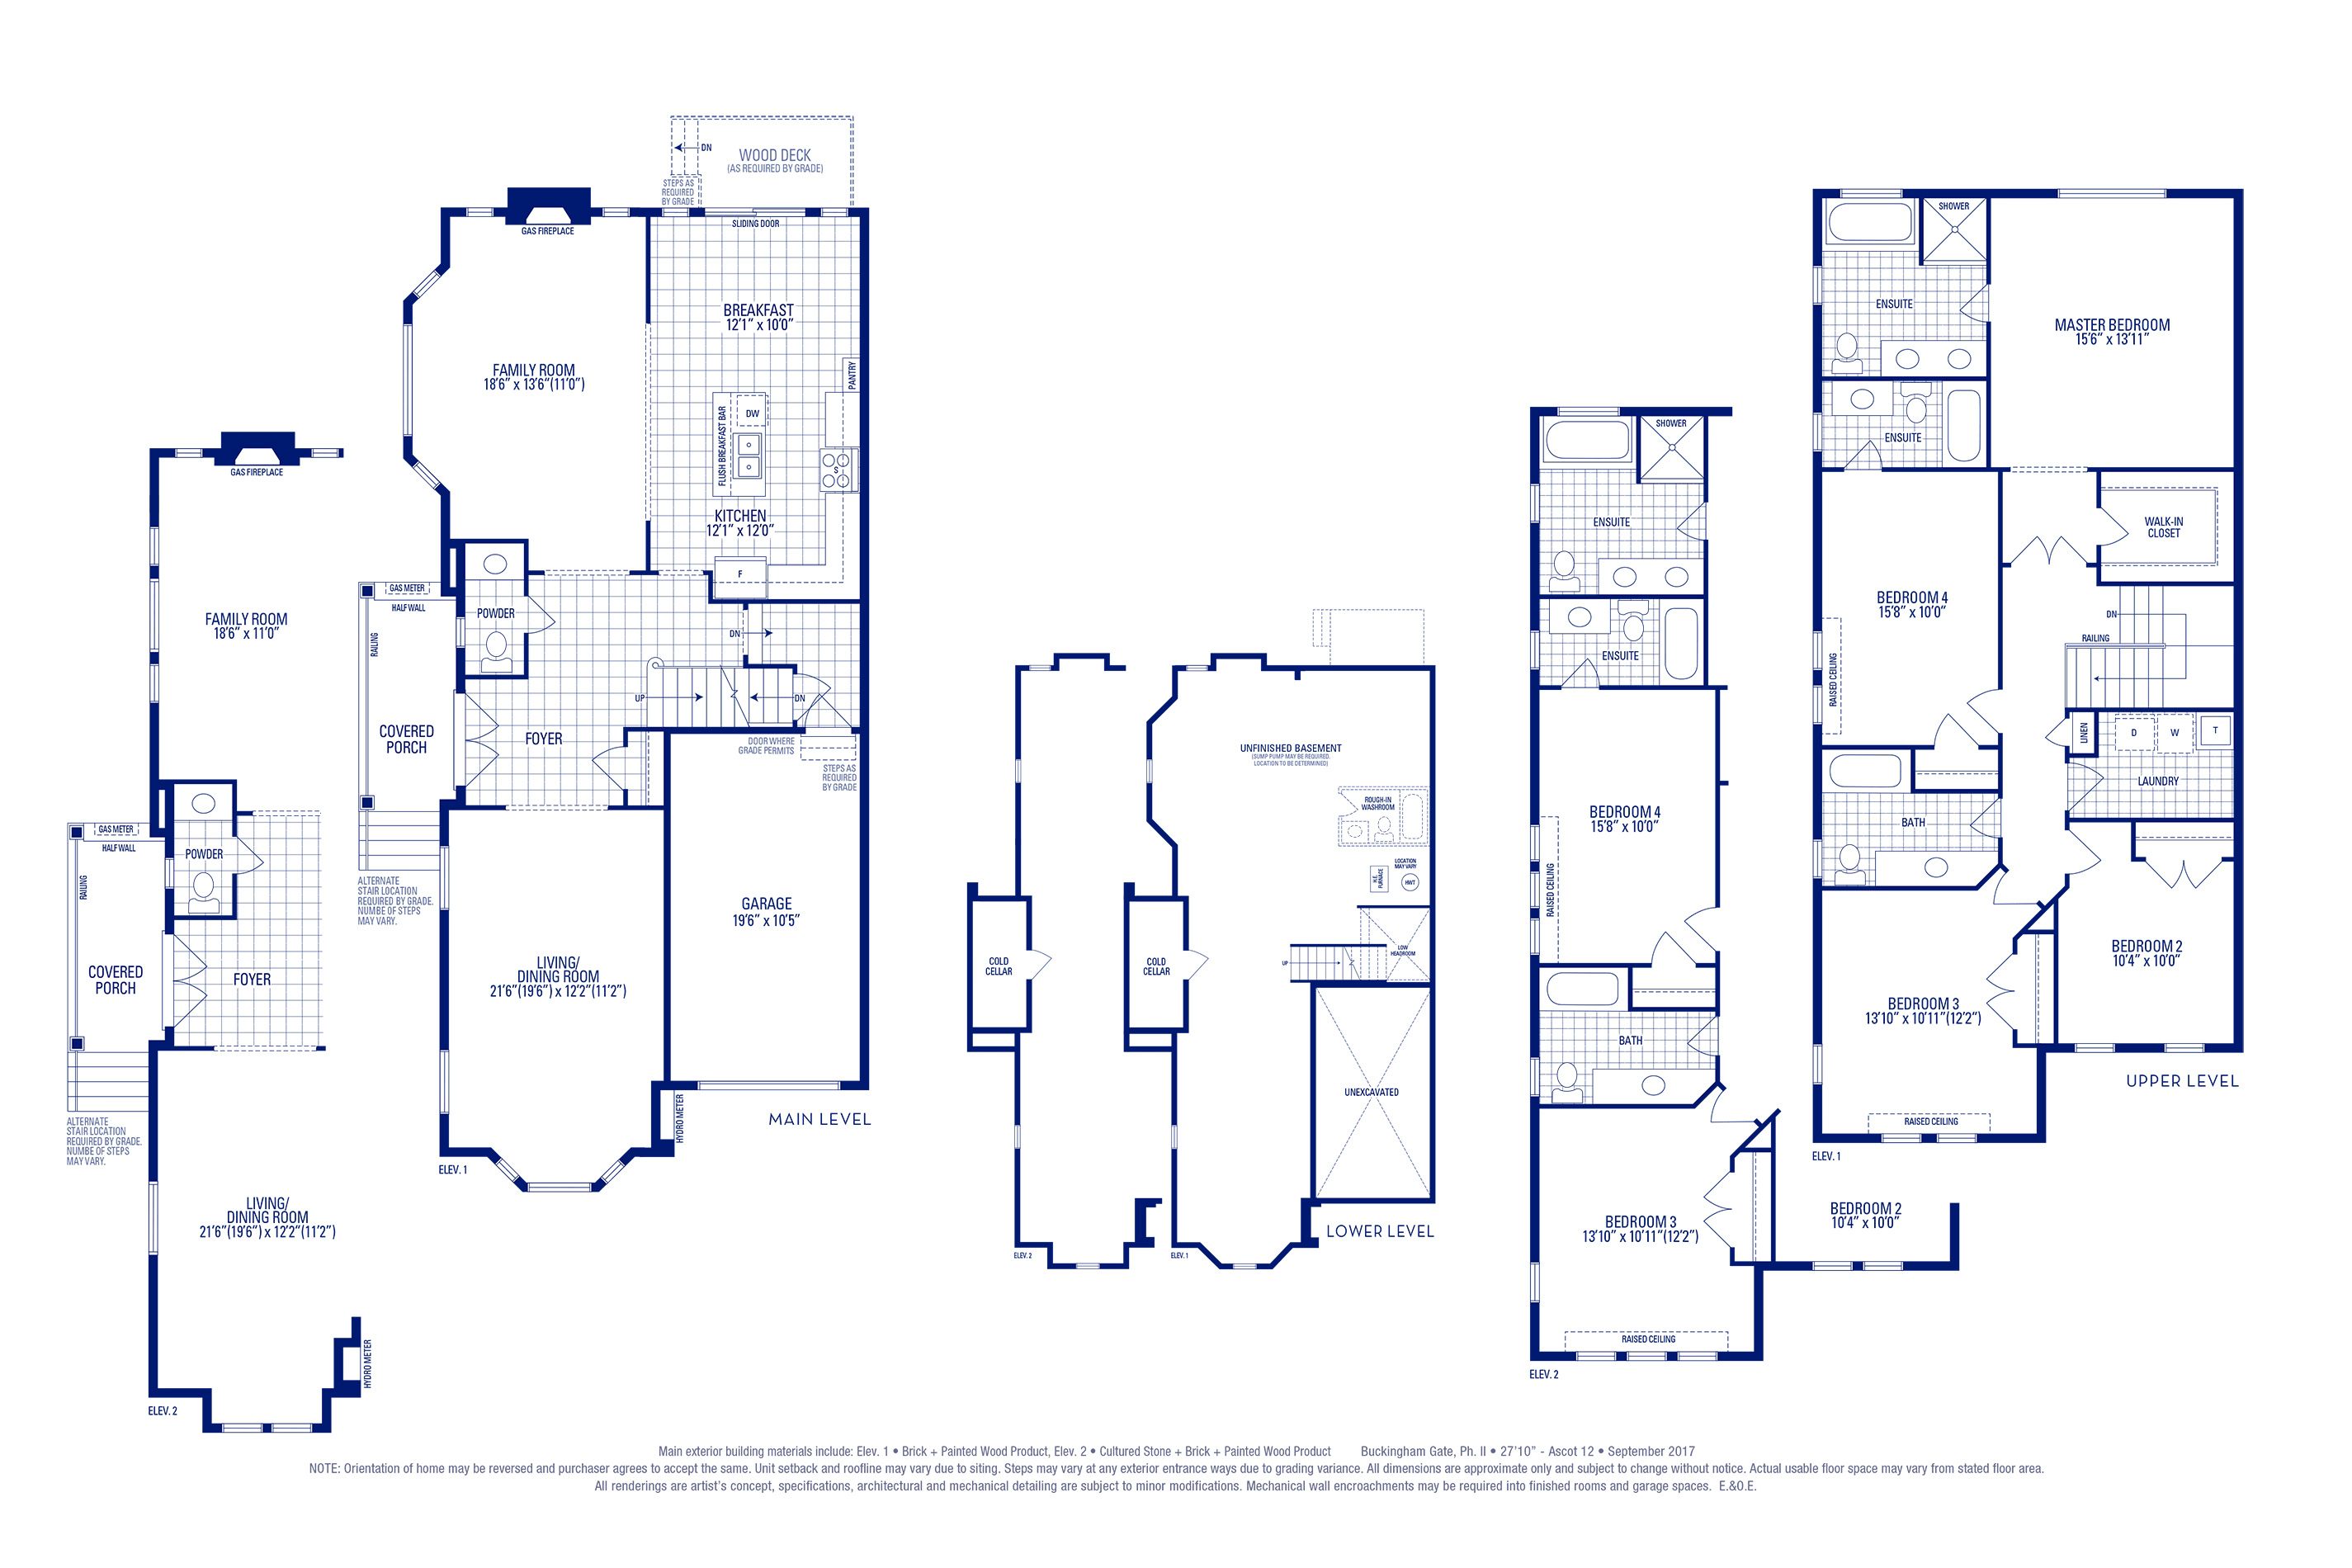 Ascot 12 Elev. 1 Floorplan